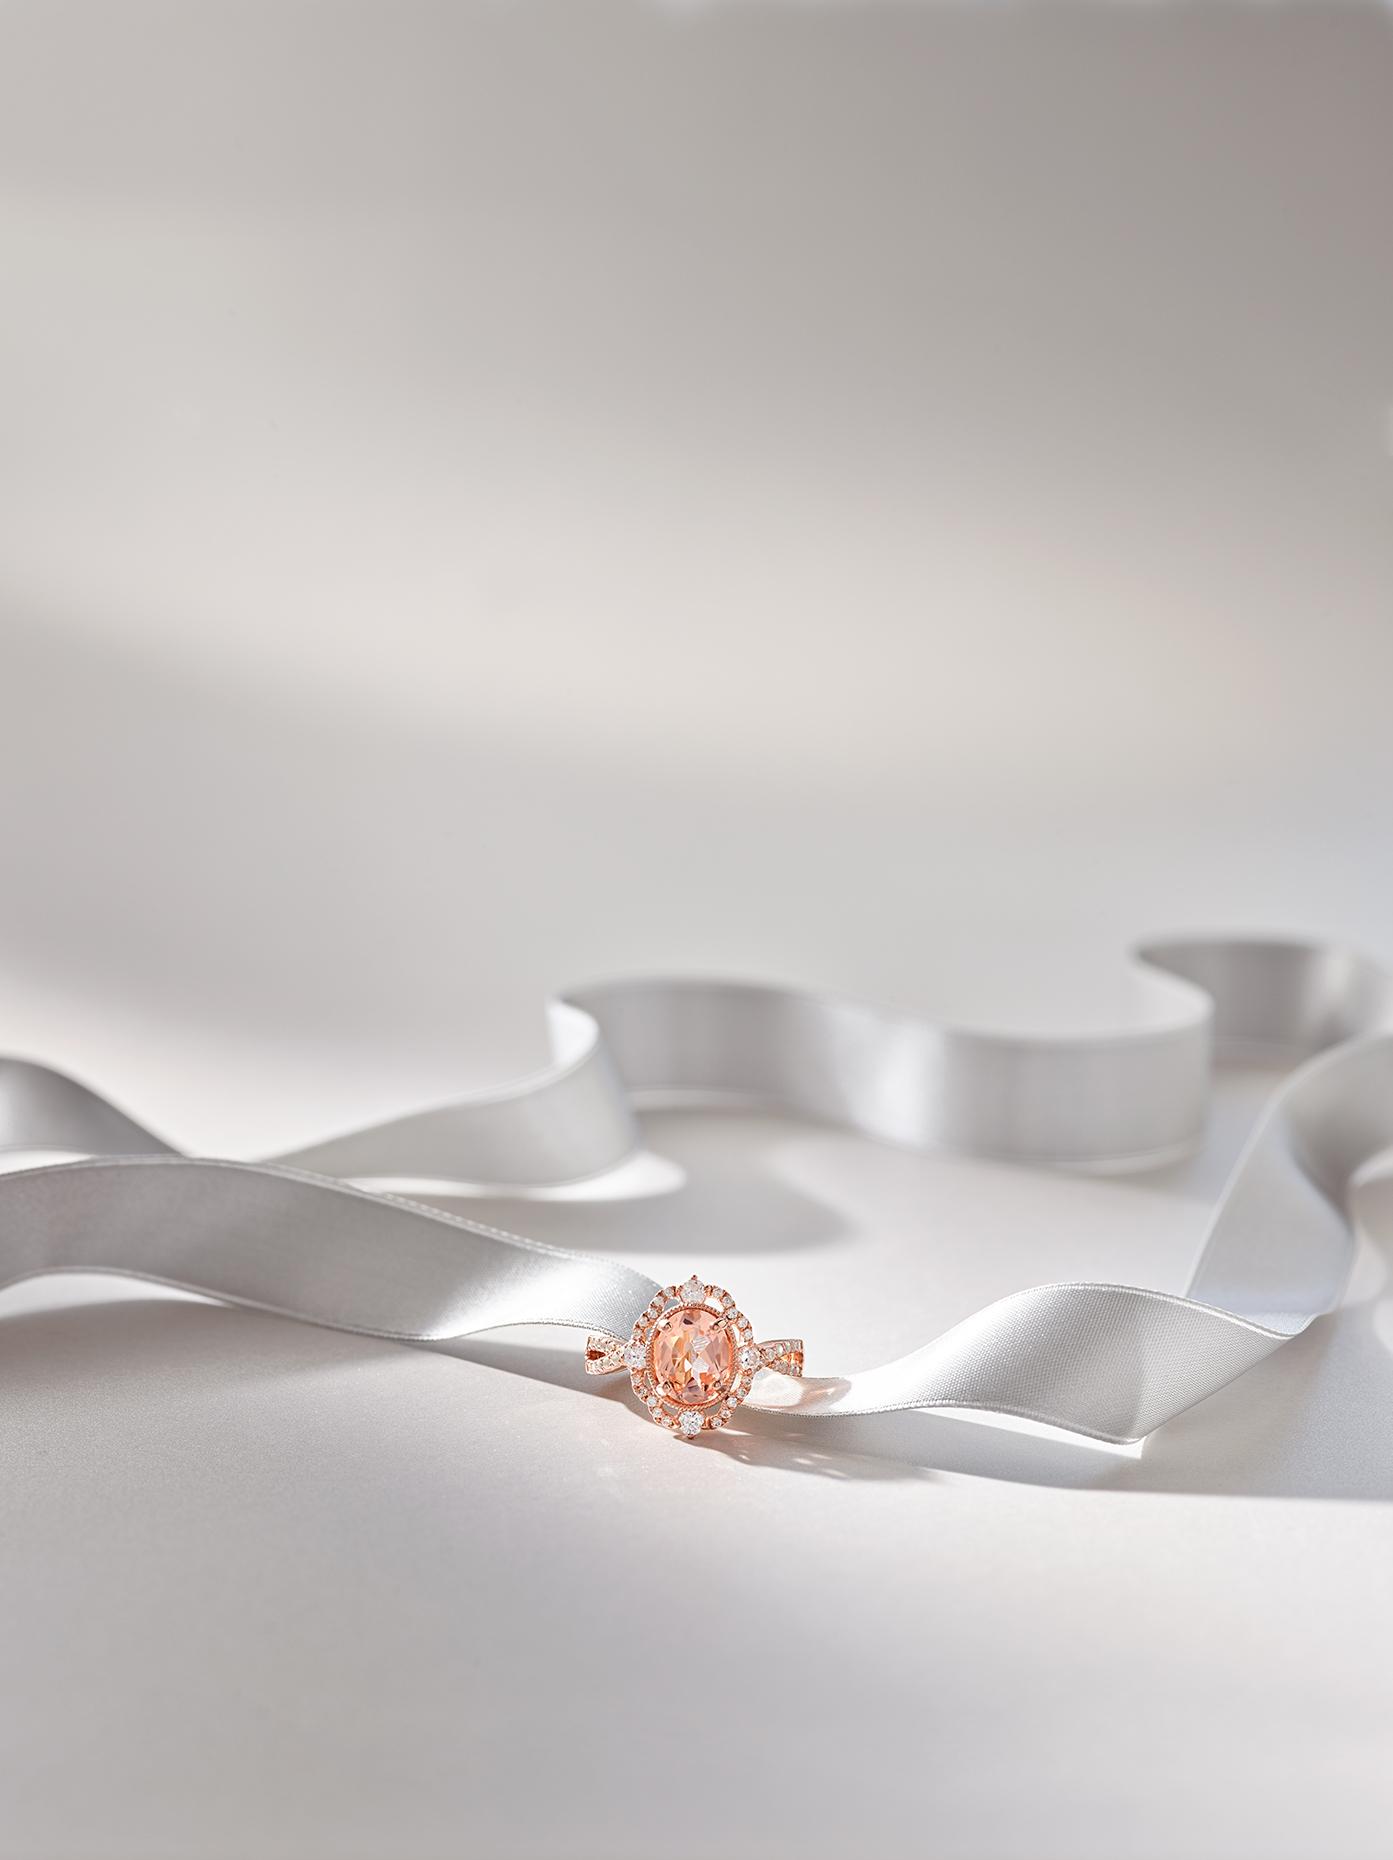 Product_photography_Jewelry_Derek_Israelsen_ZacPosen002_Diamond_.jpg